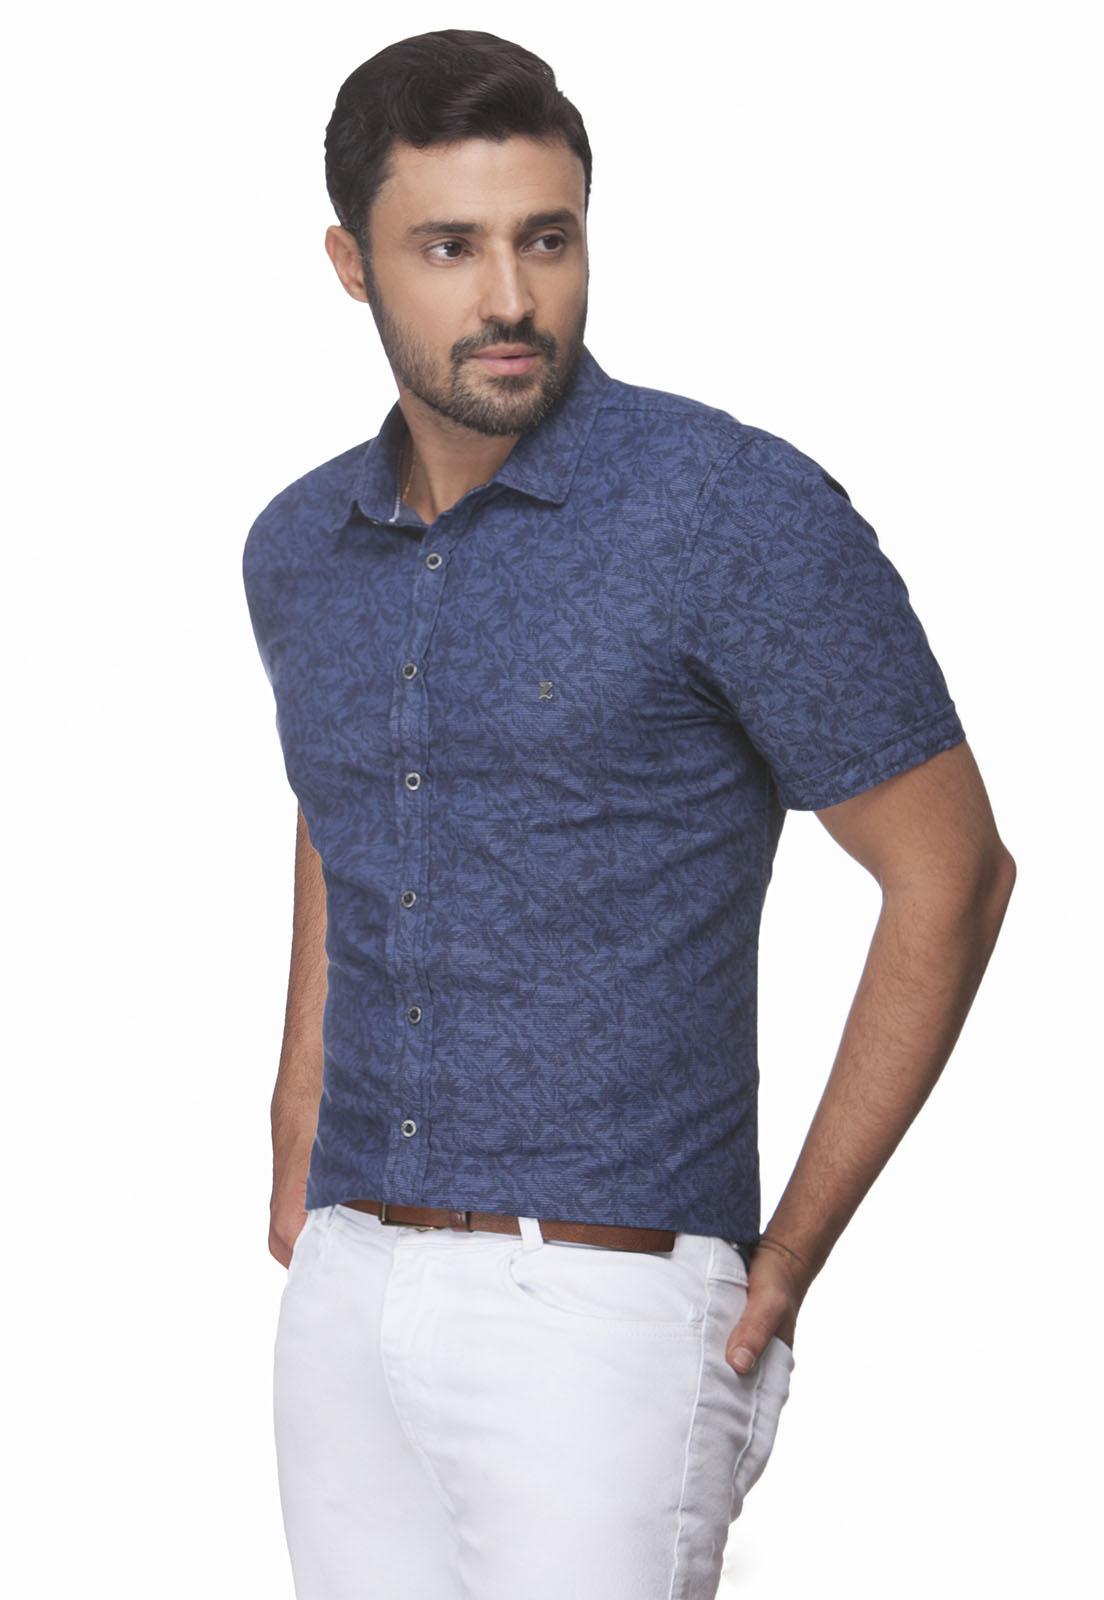 Camisa Slim Zaiko Jeans Estampada Manga Curta 2366